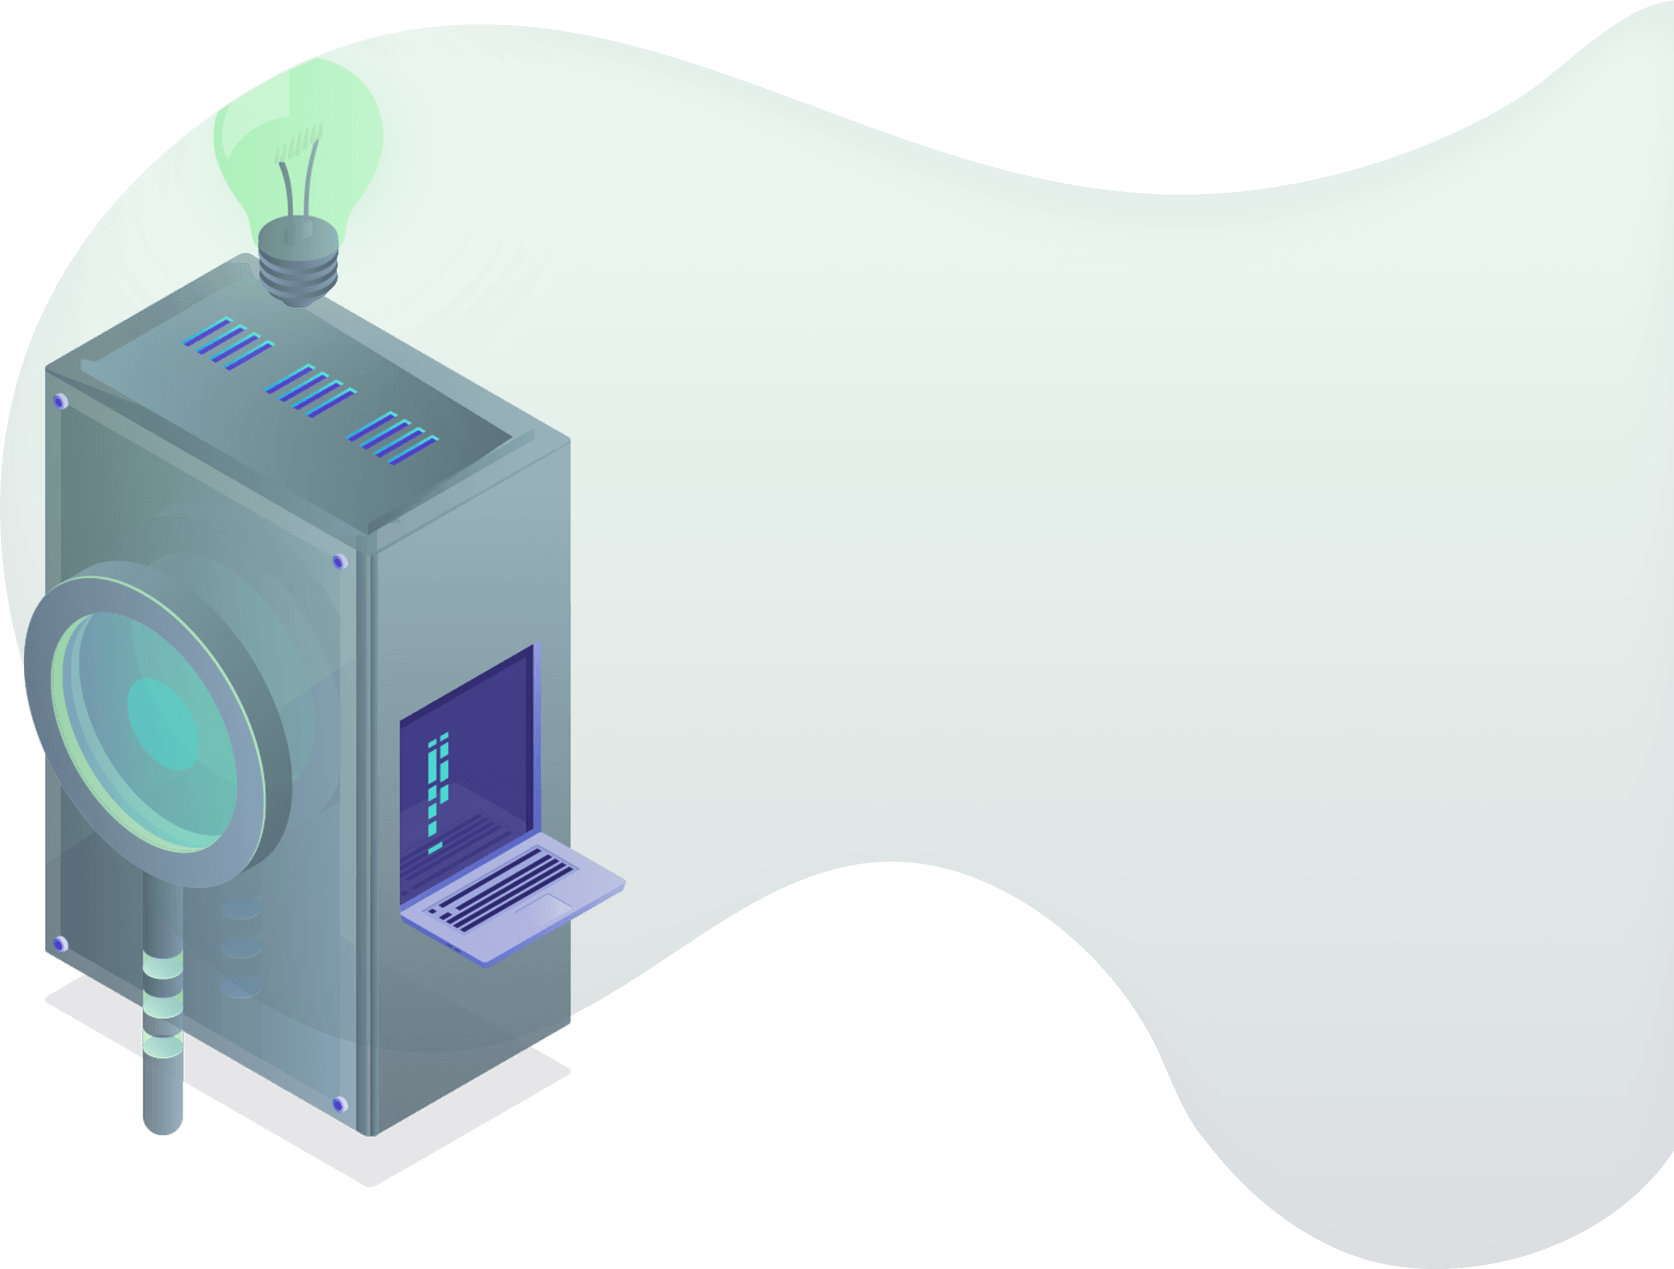 illustration of a cloud data server